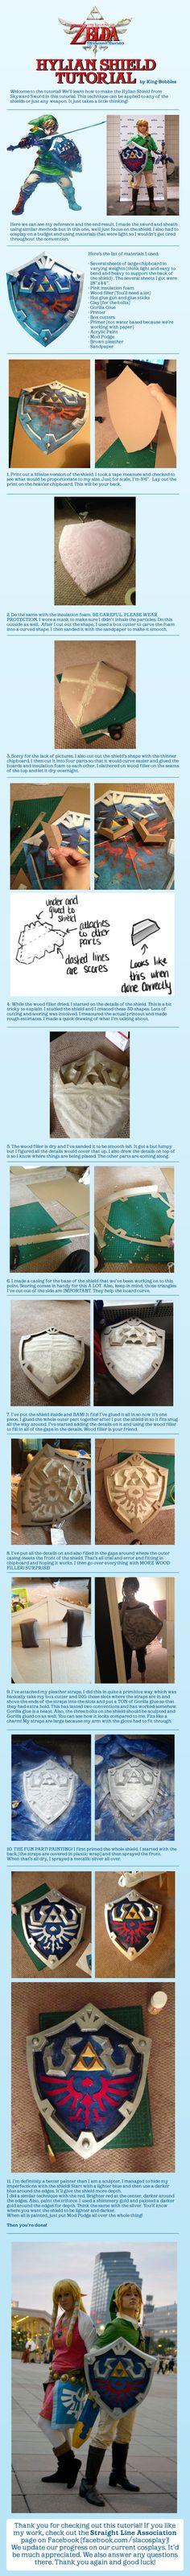 The Legend of Zelda Hylian Shield Cosplay Tutorial by King-Bobbles.deviantart.com on @deviantART